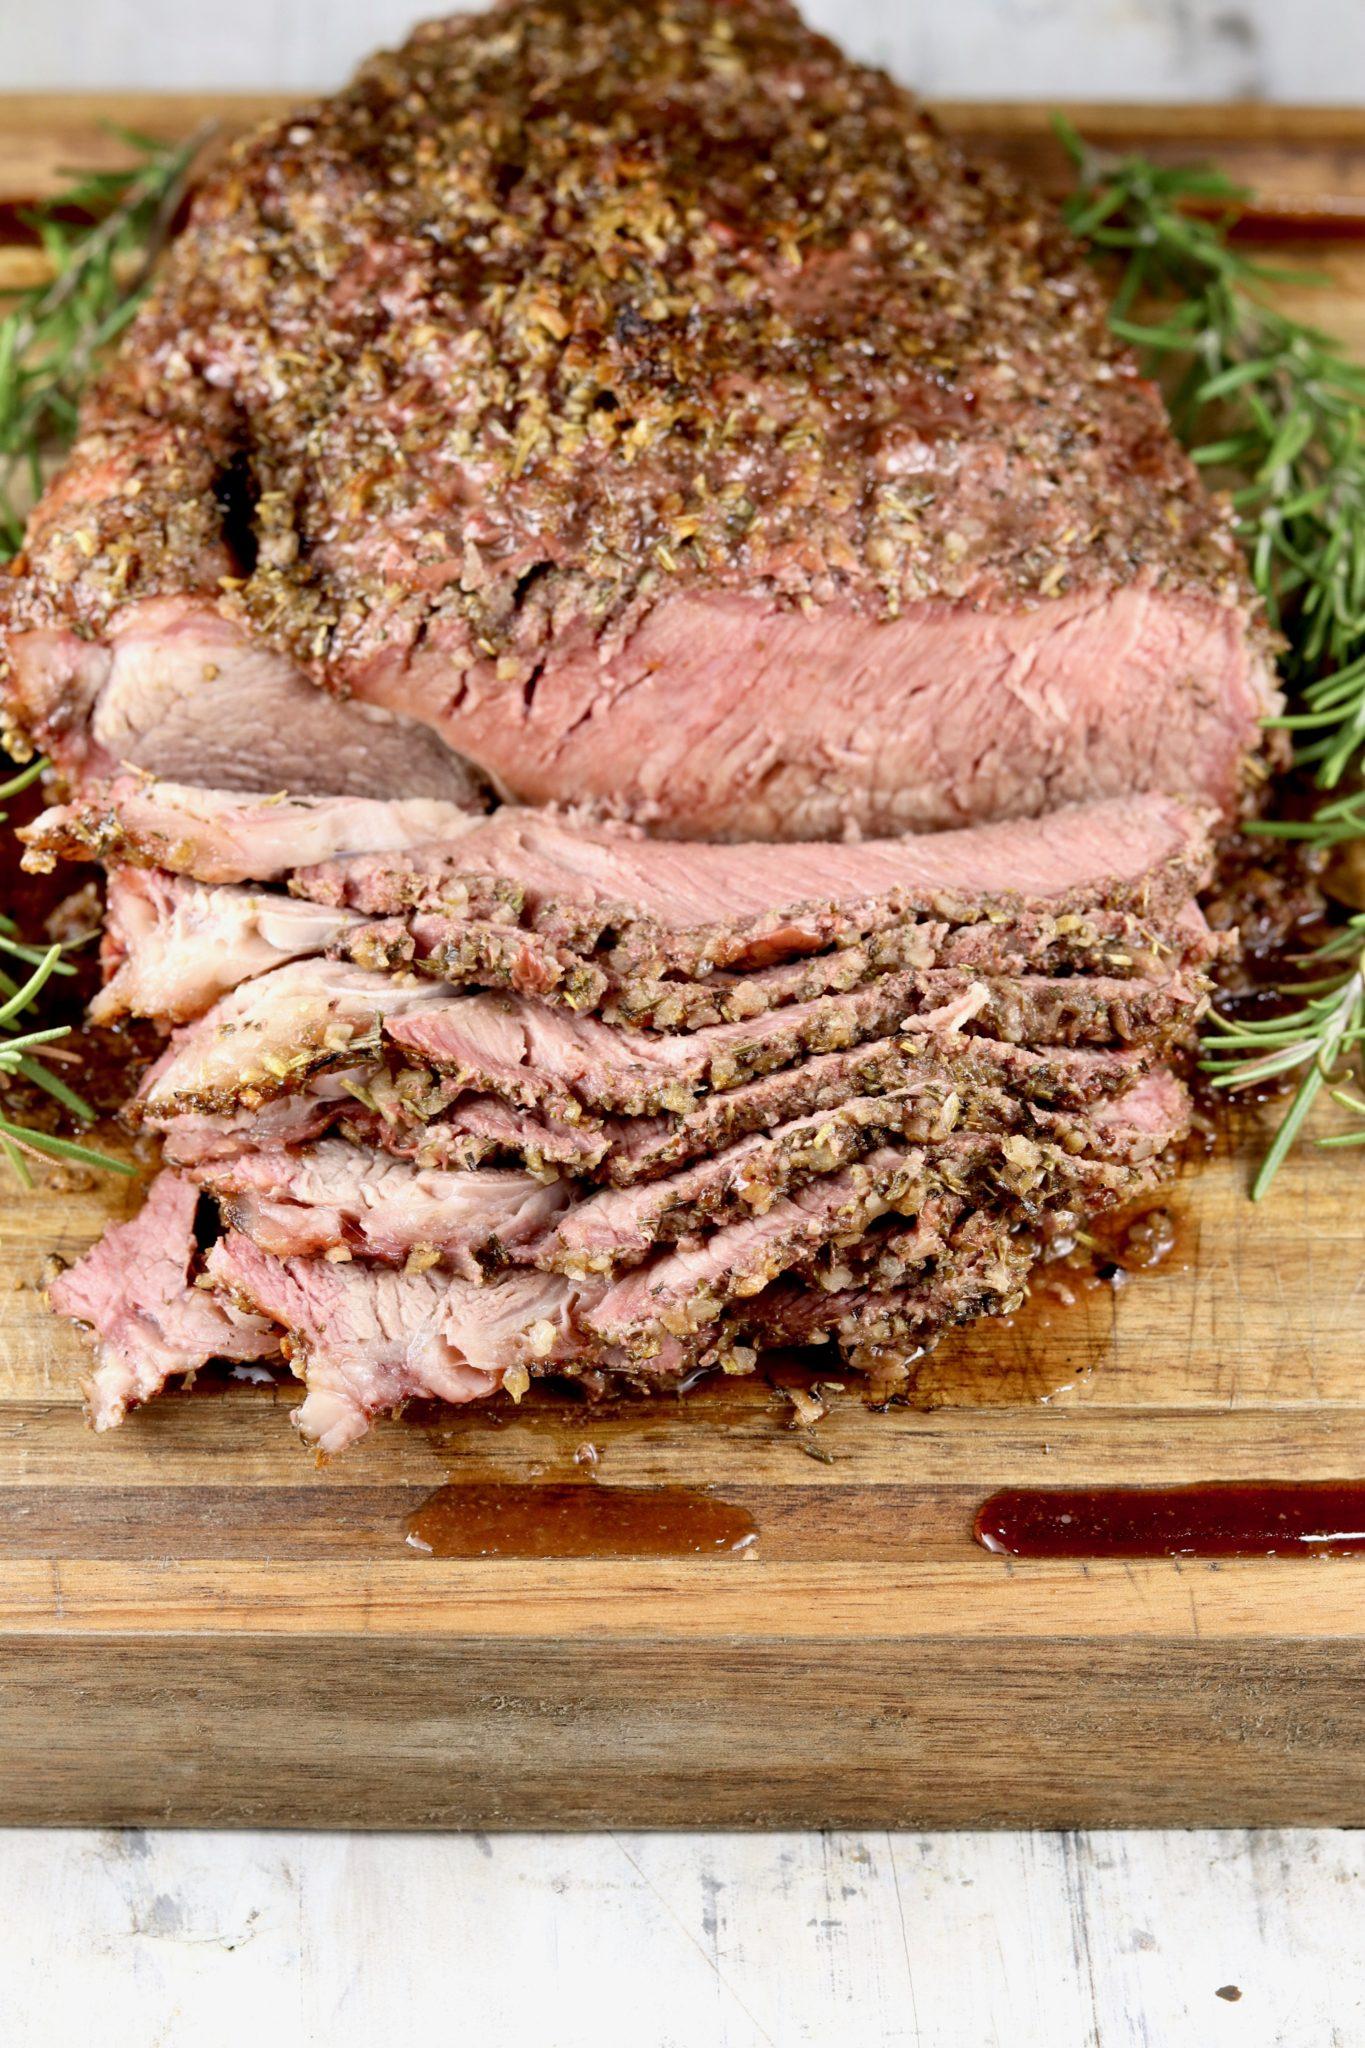 Sliced roast beef with herbs